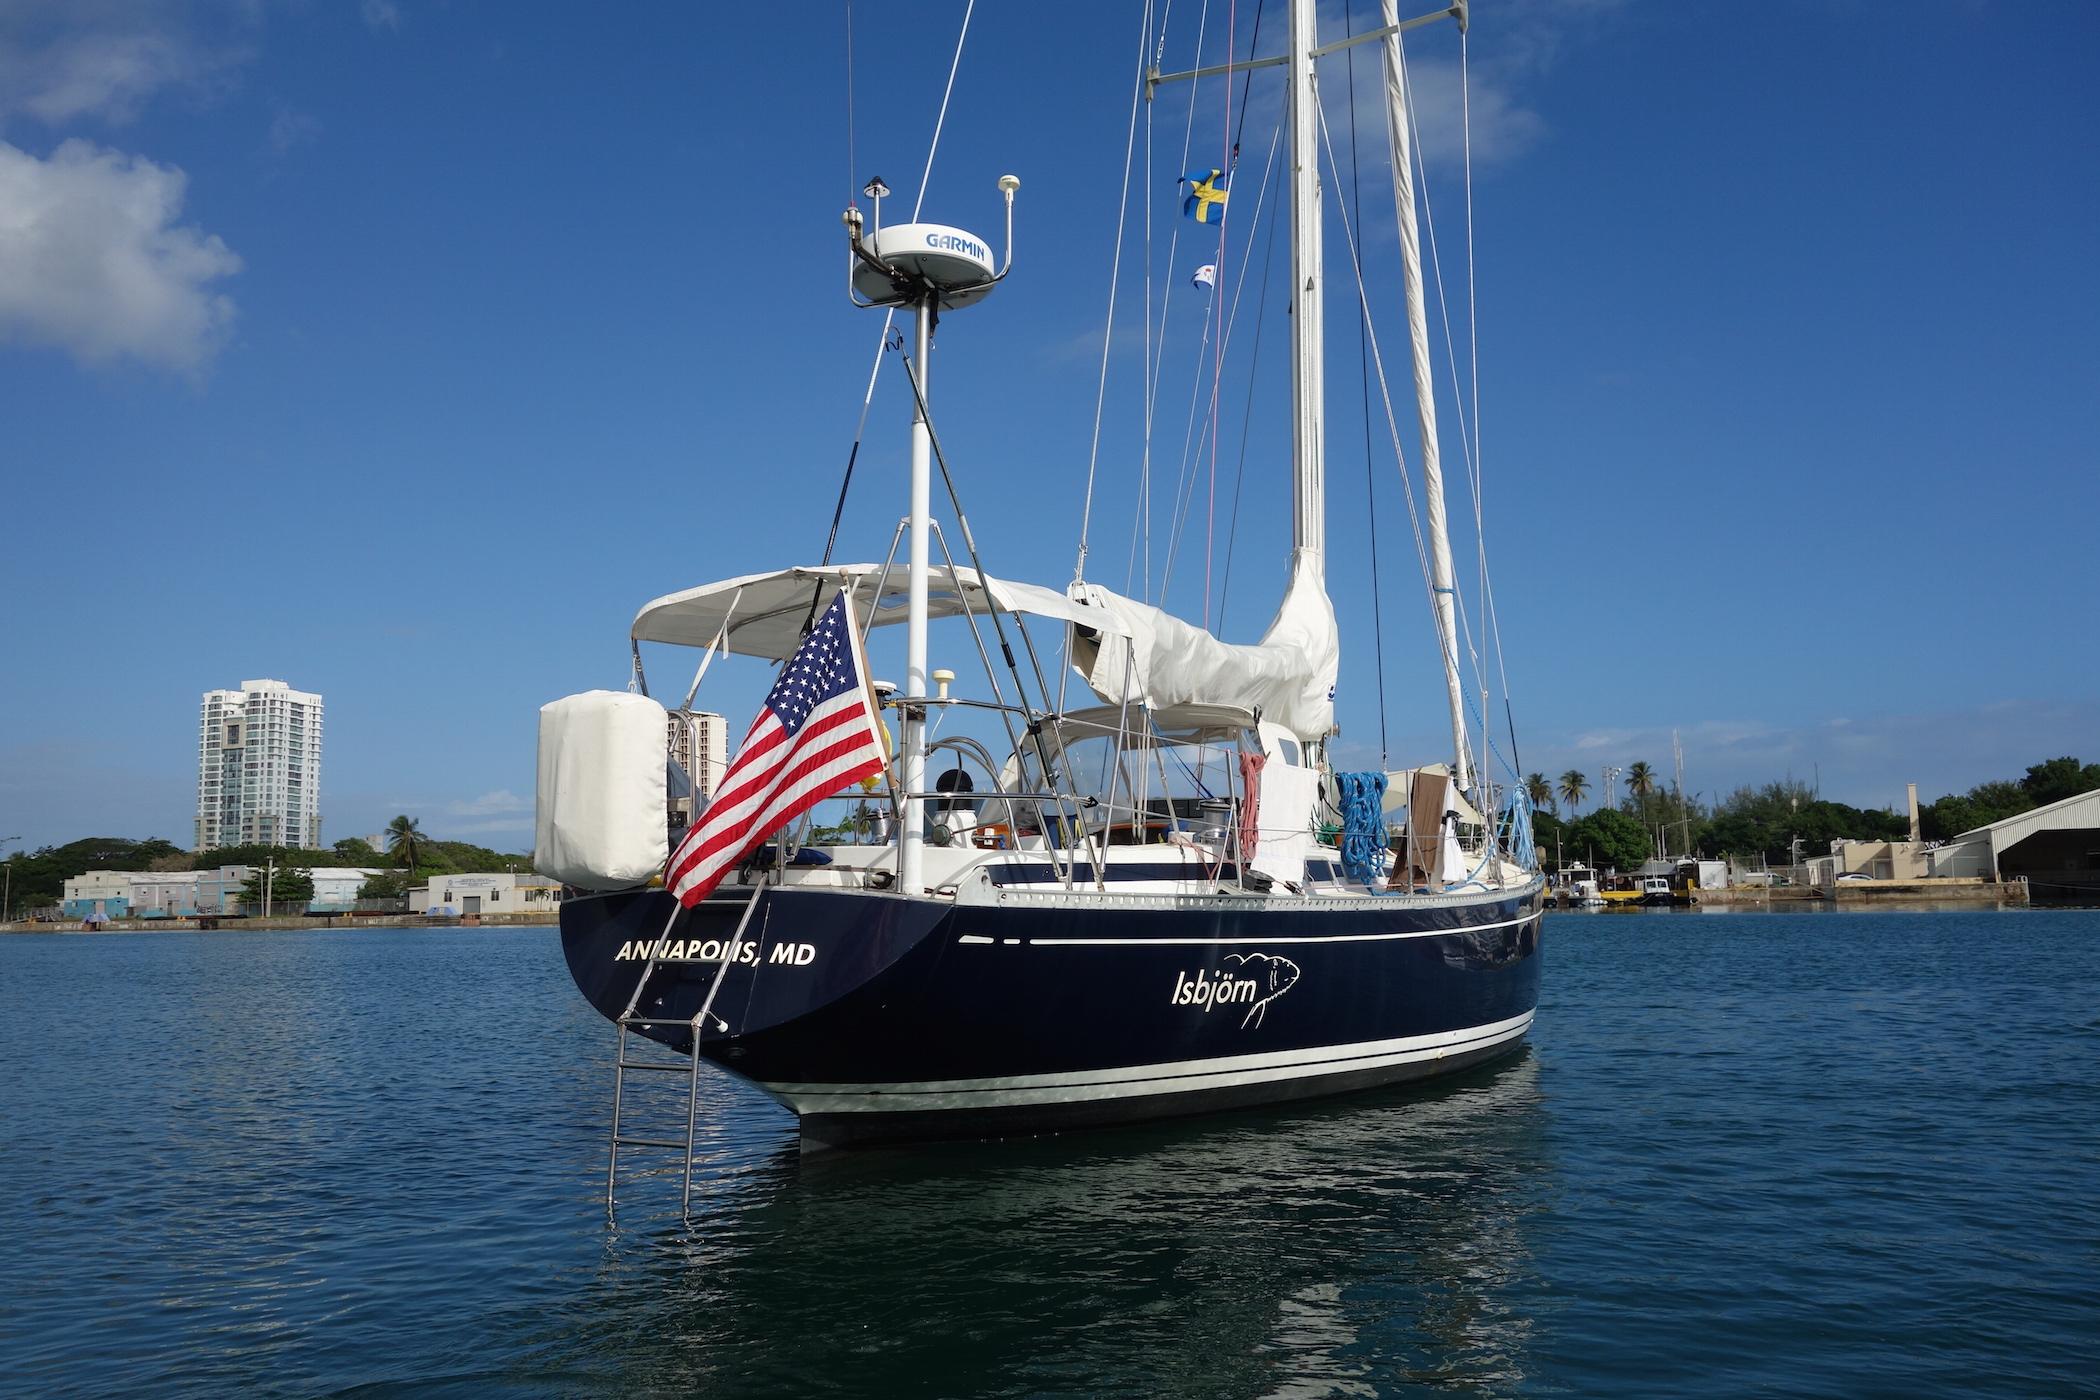 Isbjorn  anchored in the harbor of San Juan, Puerto Rico.